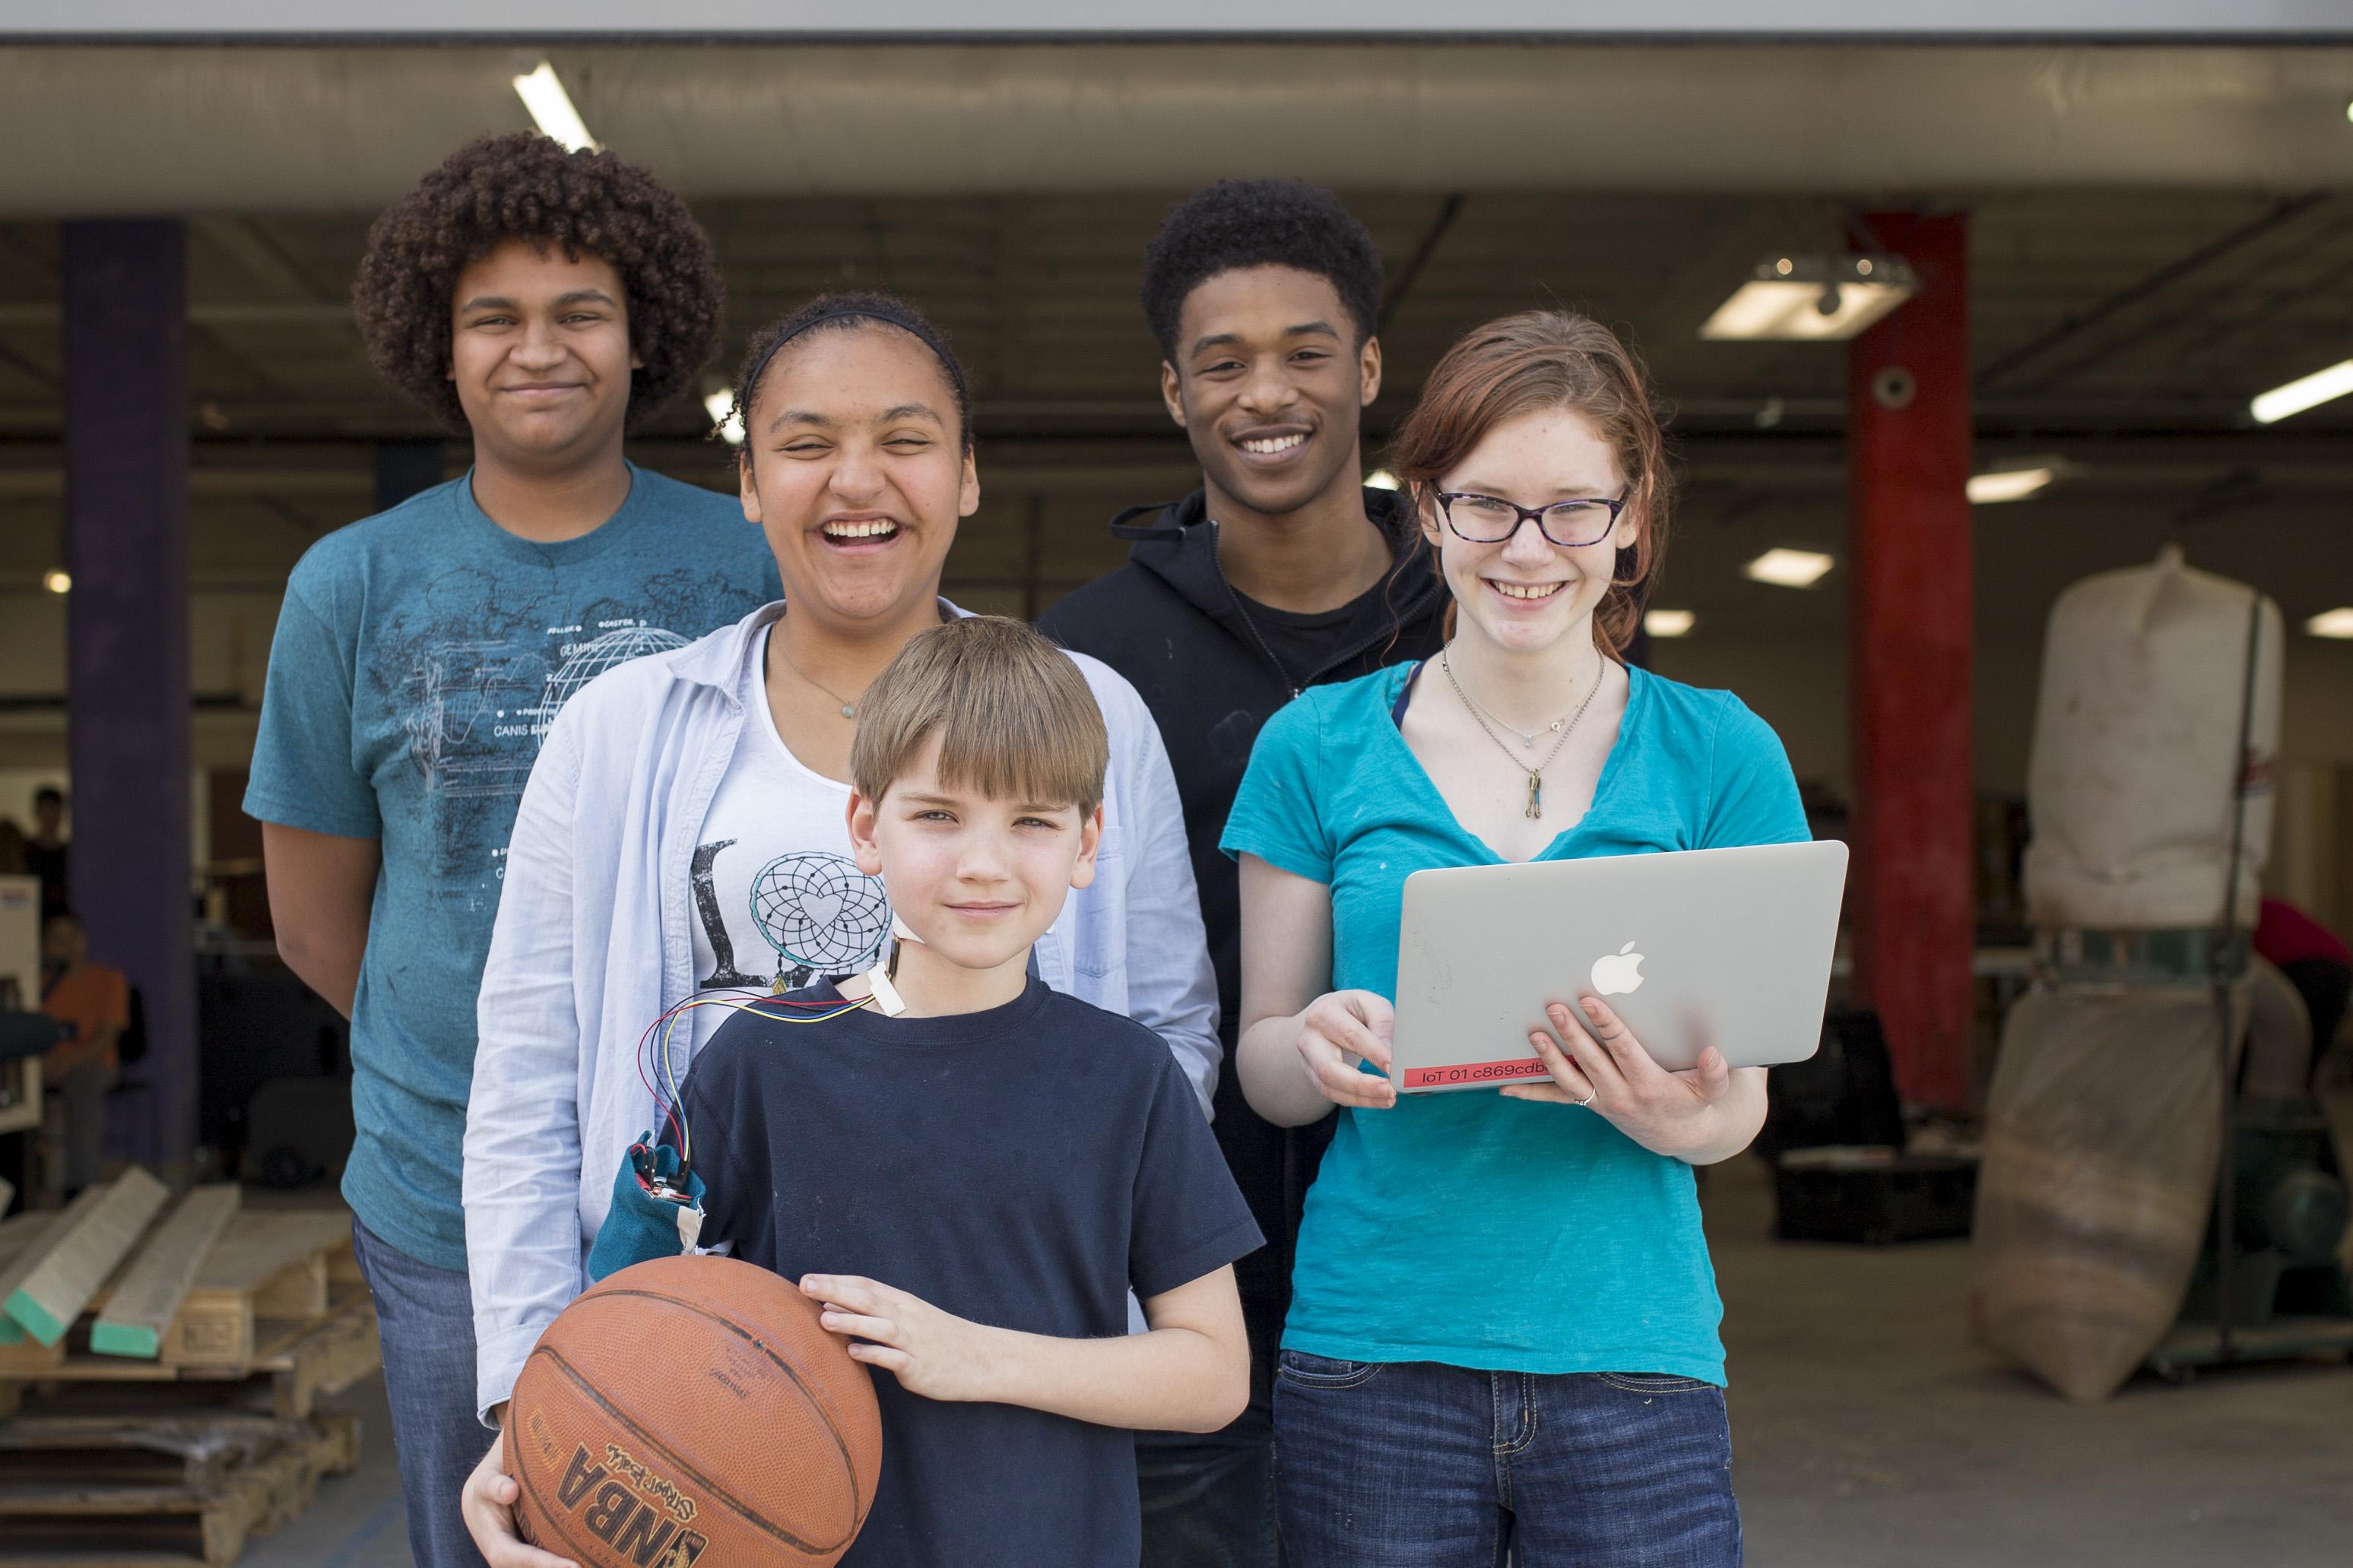 Nebraska Youth To Explore Wearable Tech In Stem Challenge